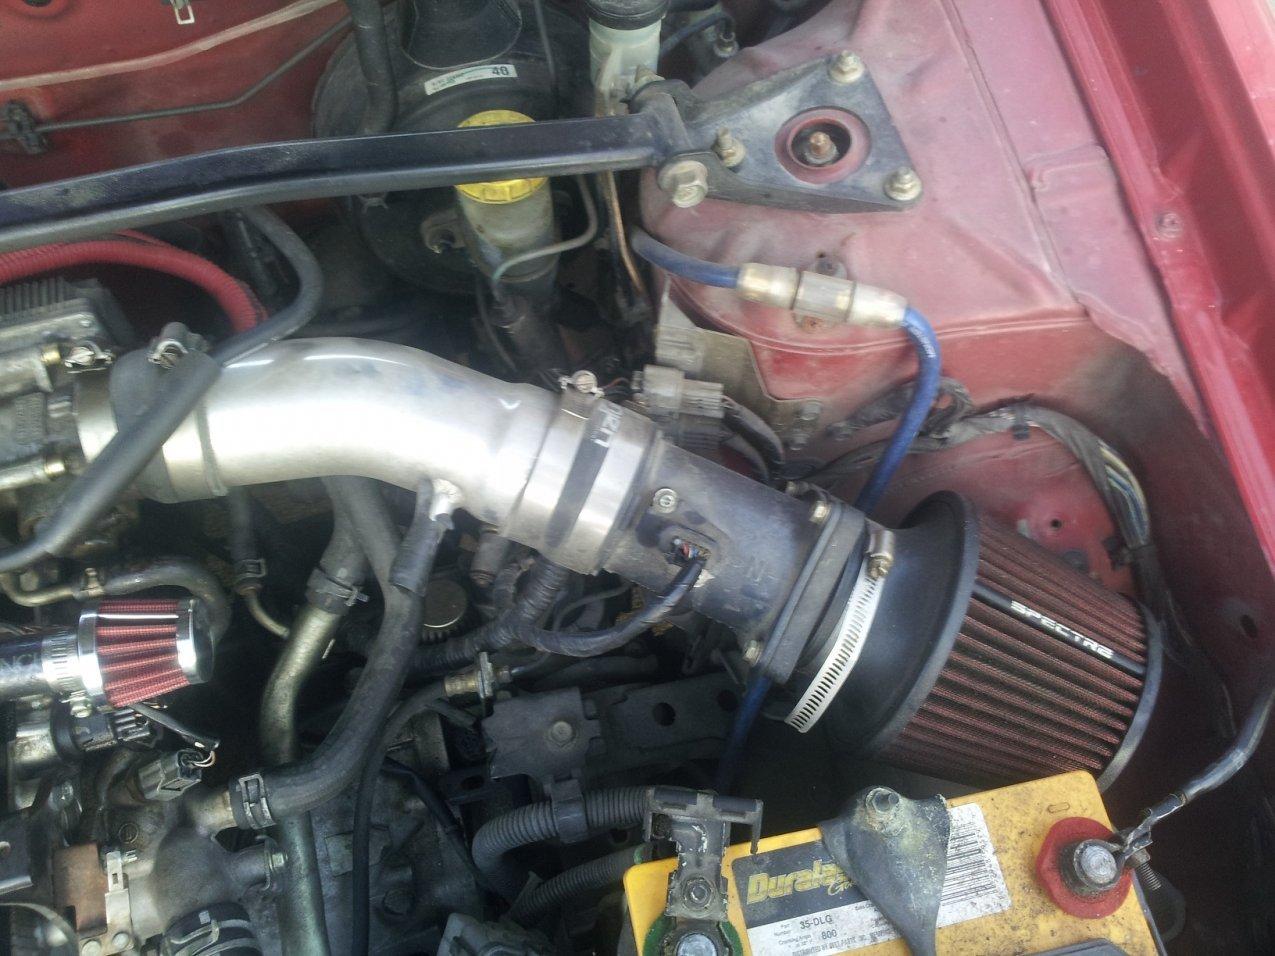 FS: AEBS Header/S Pipe, 05 ECU, Megan Catback Exhaust, OBX ...